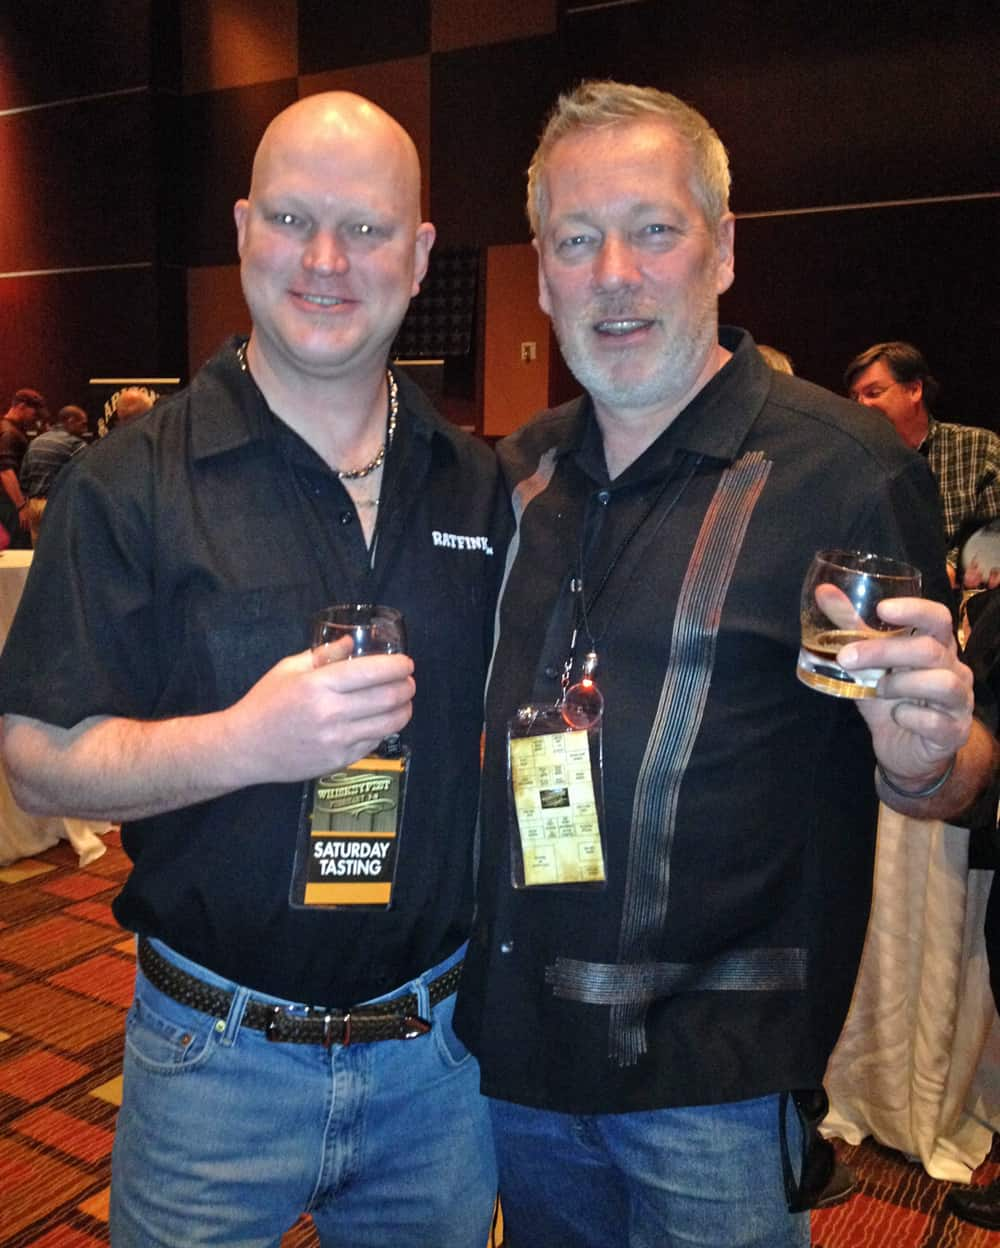 WhiskeyFest 2014 - James Walkenshaw and A.D.Cook, Las Vegas, NV